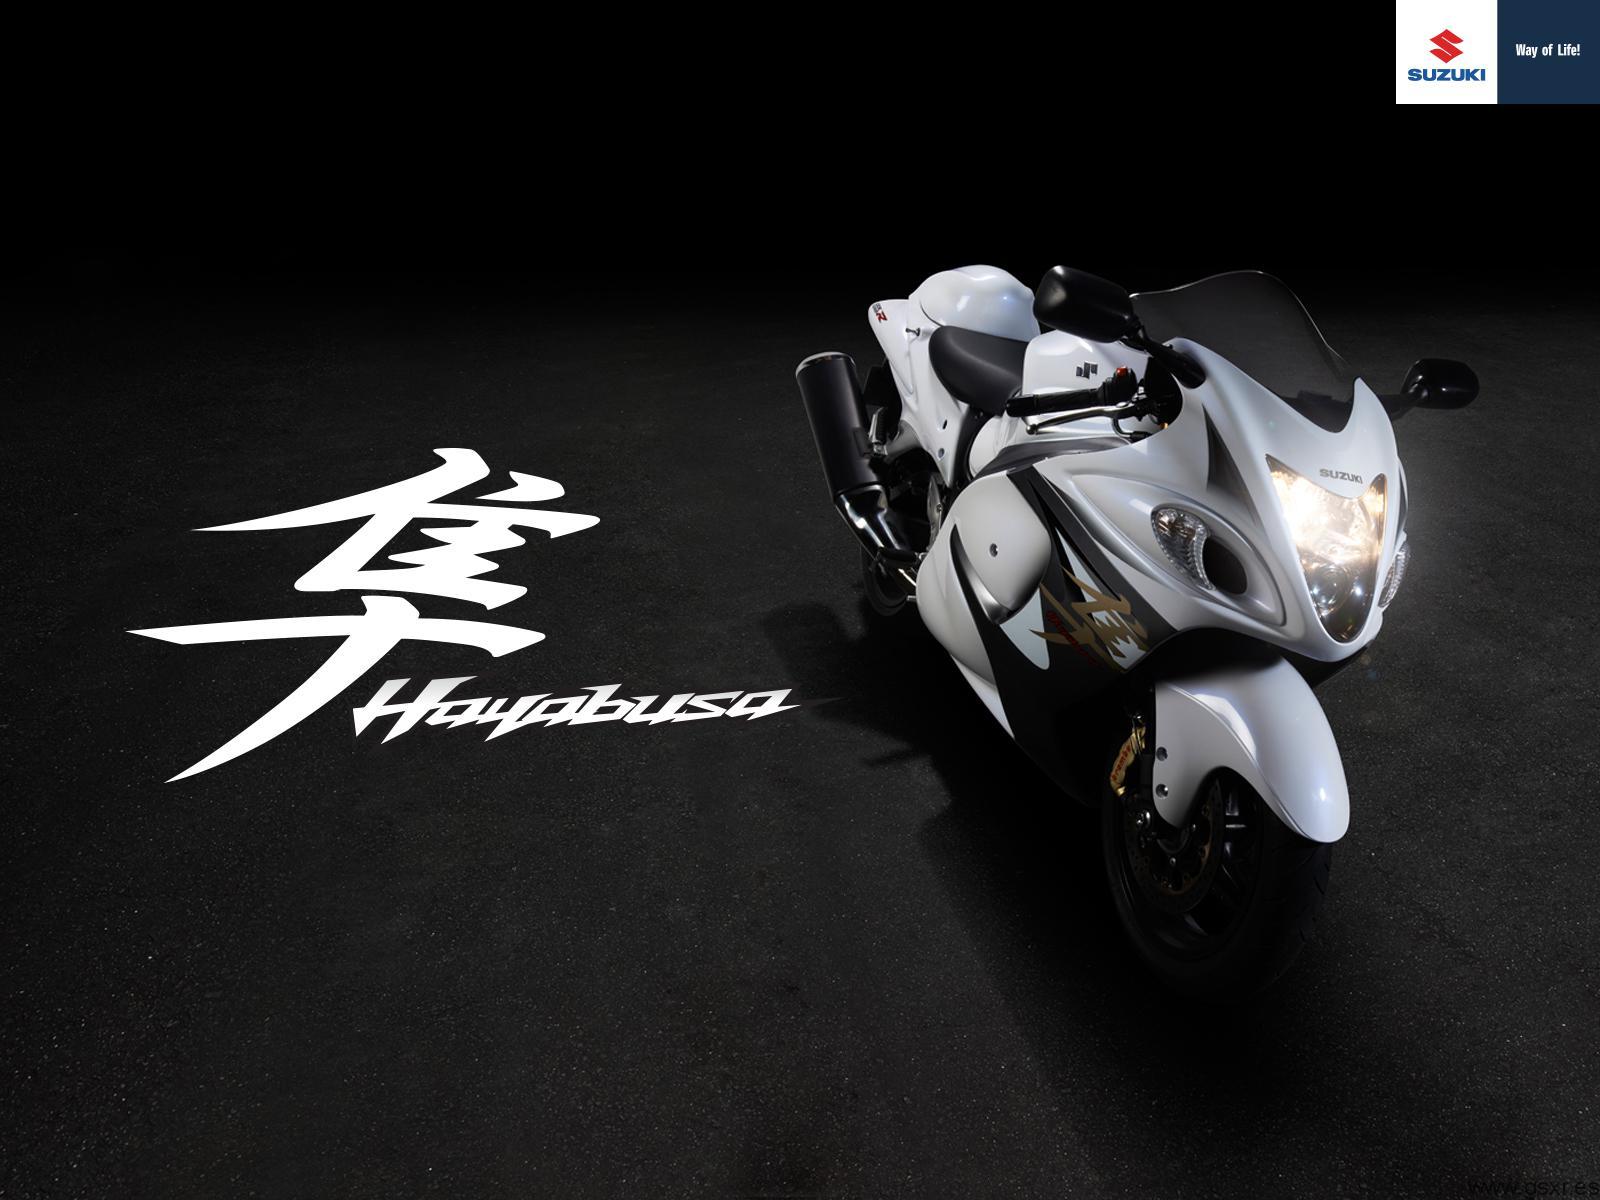 49 Suzuki Hayabusa Wallpaper On Wallpapersafari